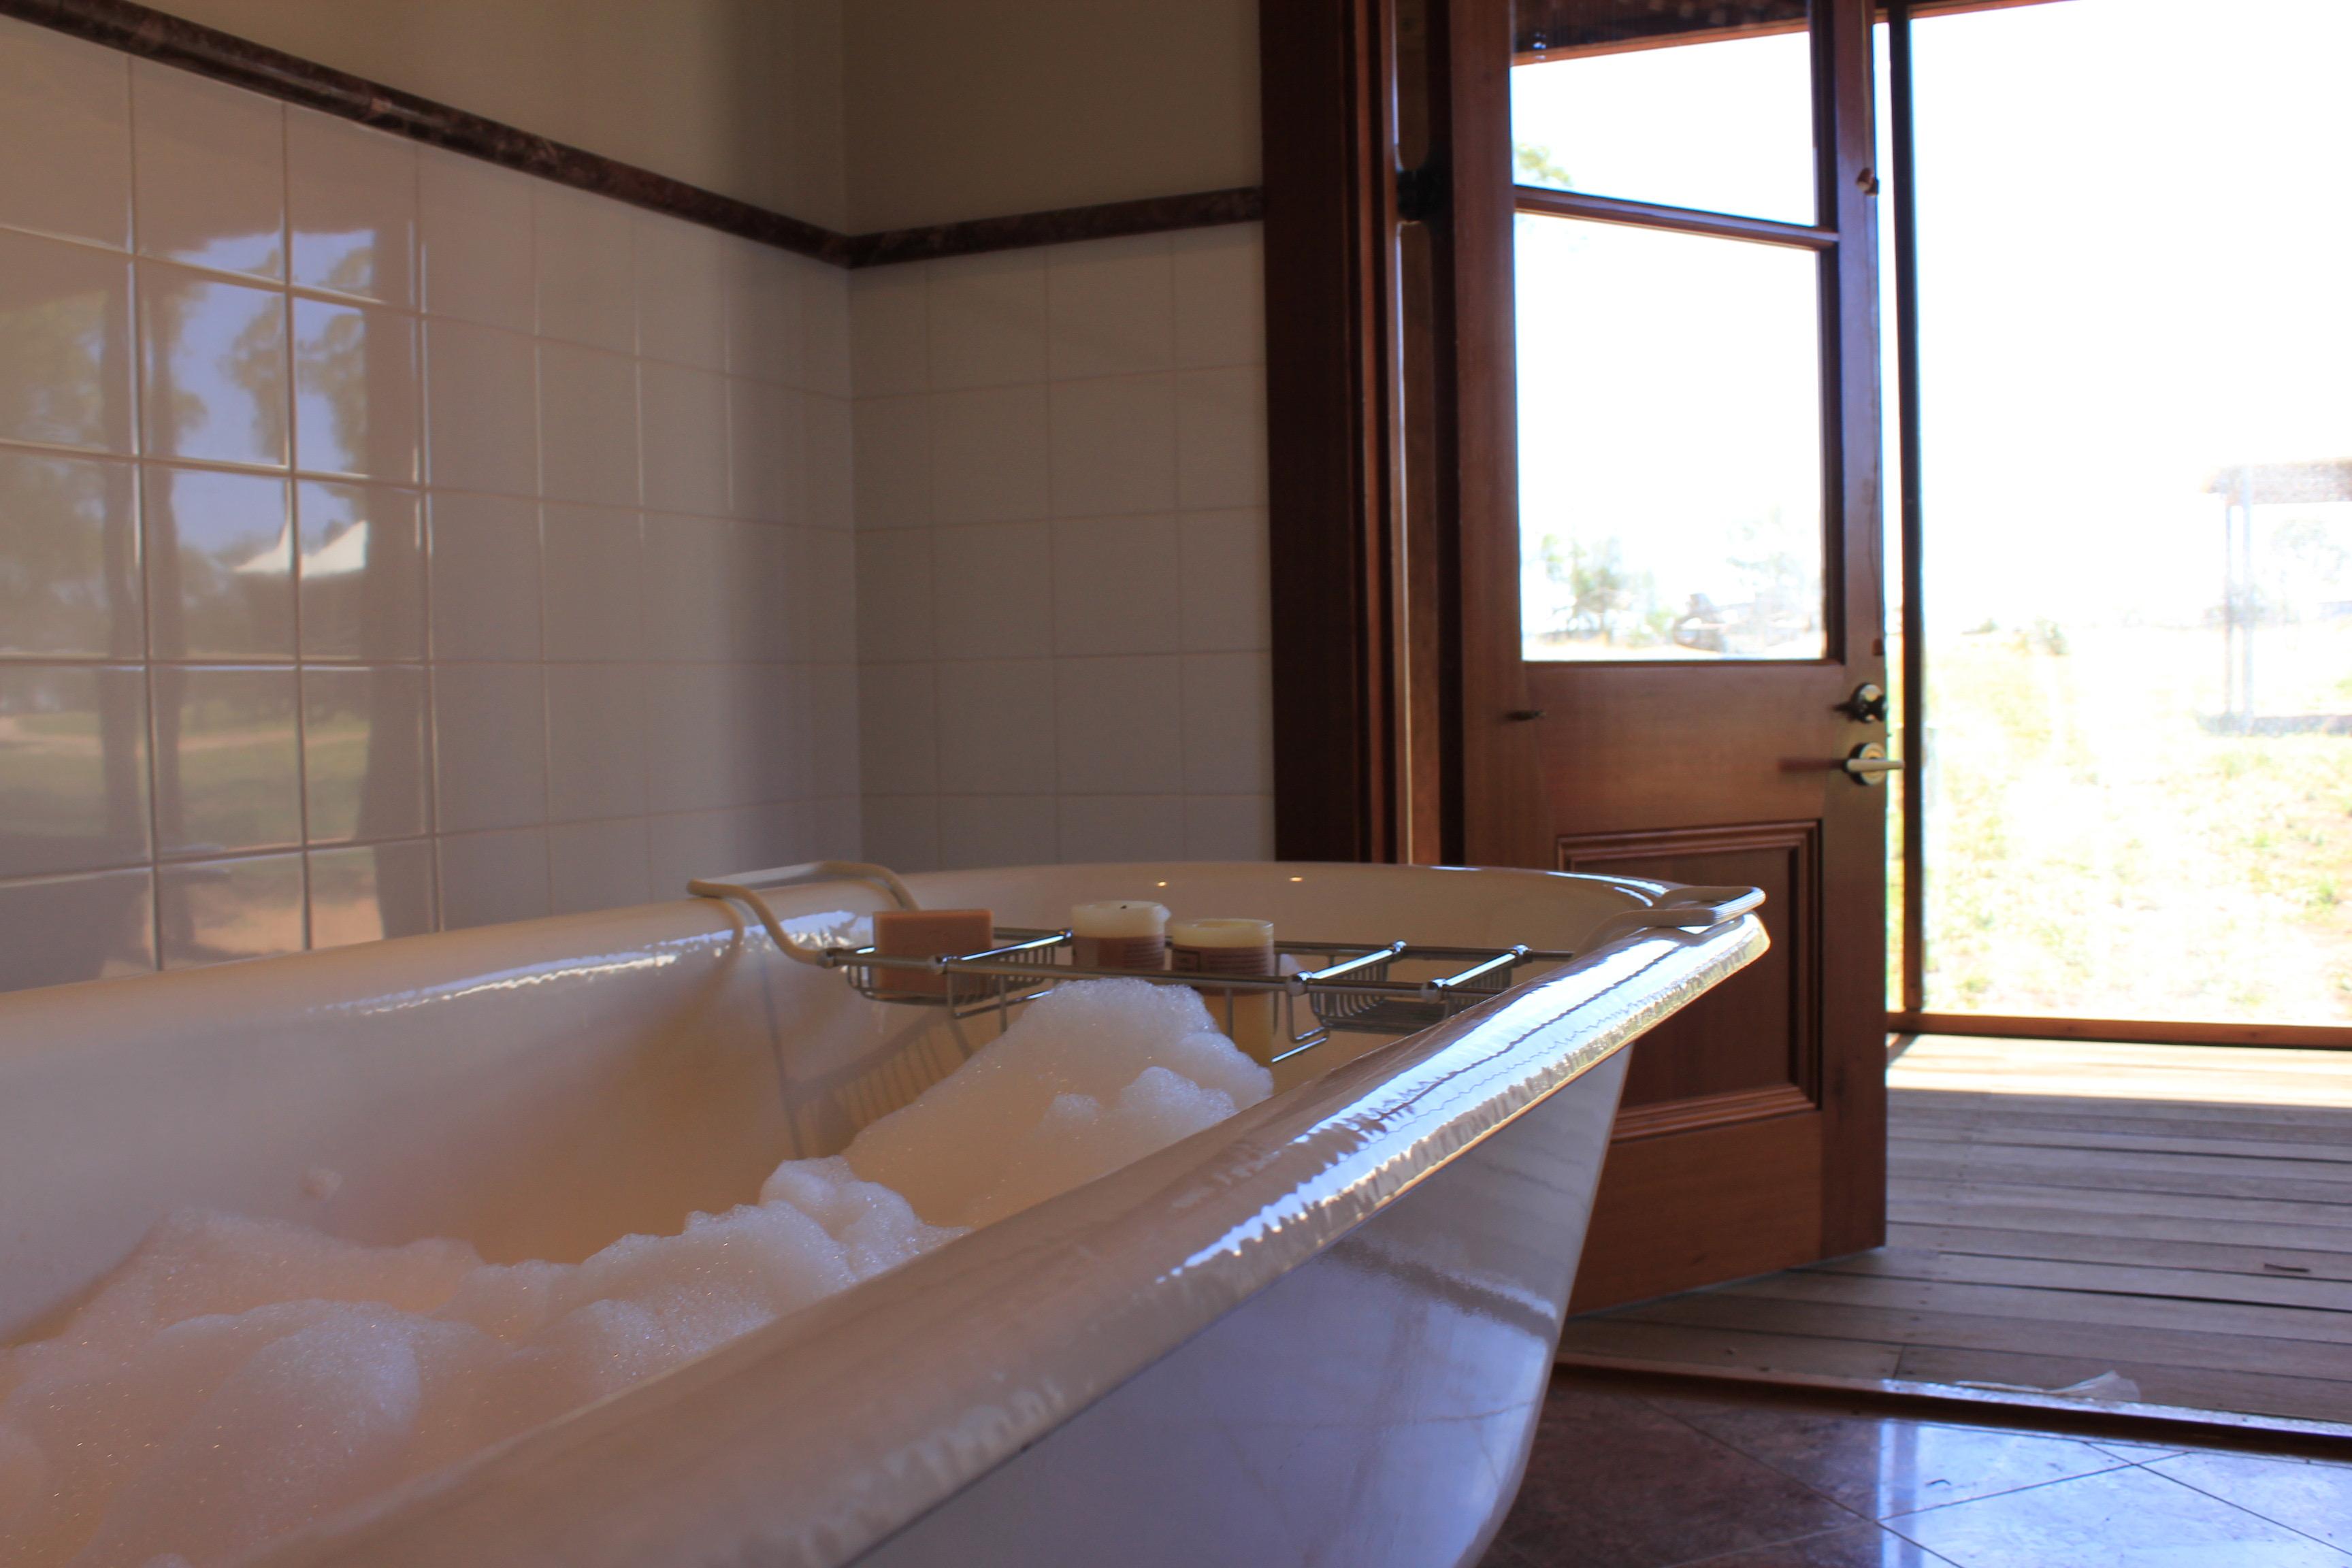 Wiradjuri Bathroom Bubblebath